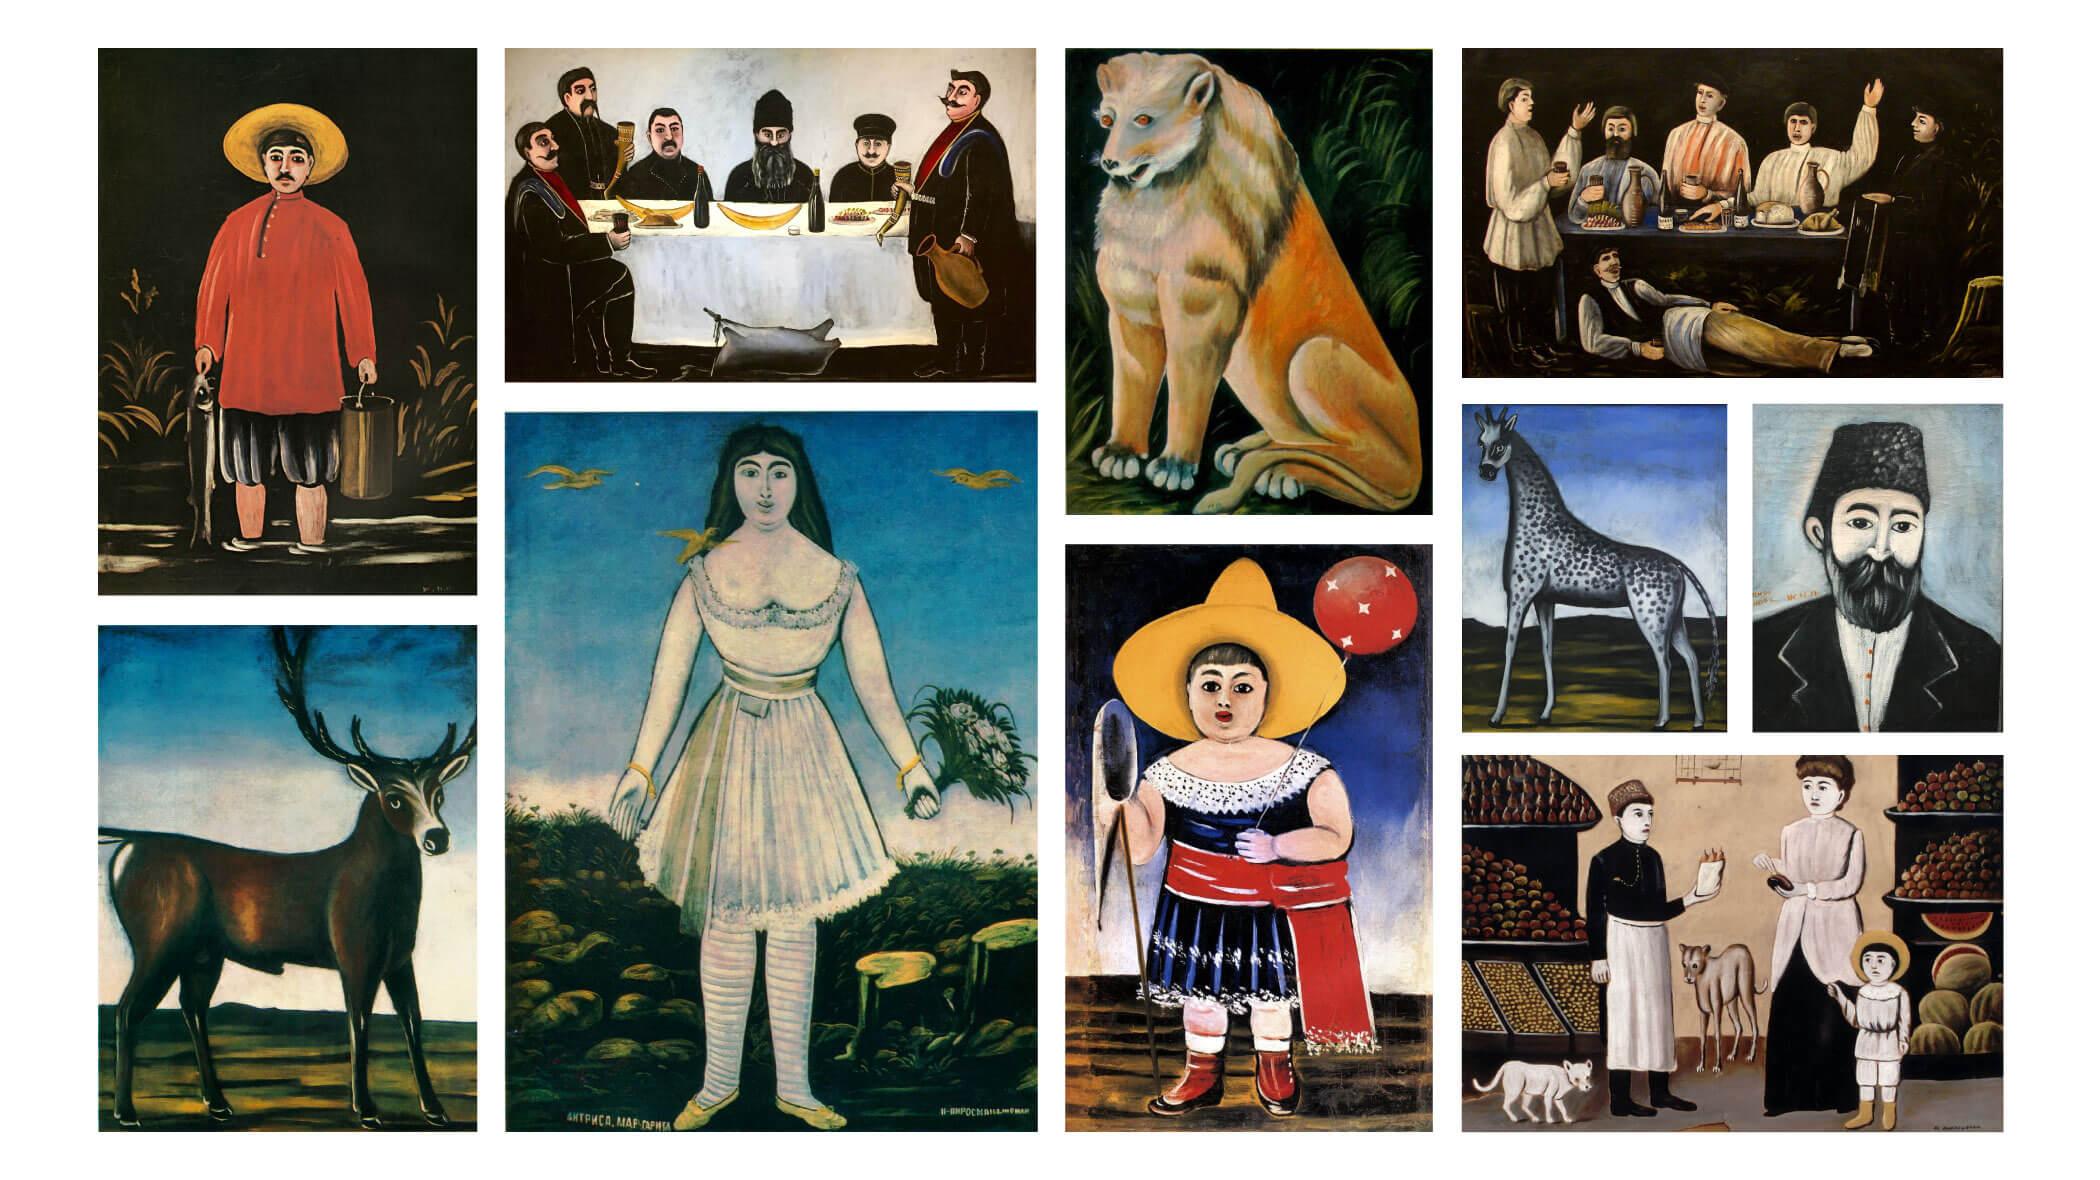 Pirosmani-Paintings-2K-q60-03